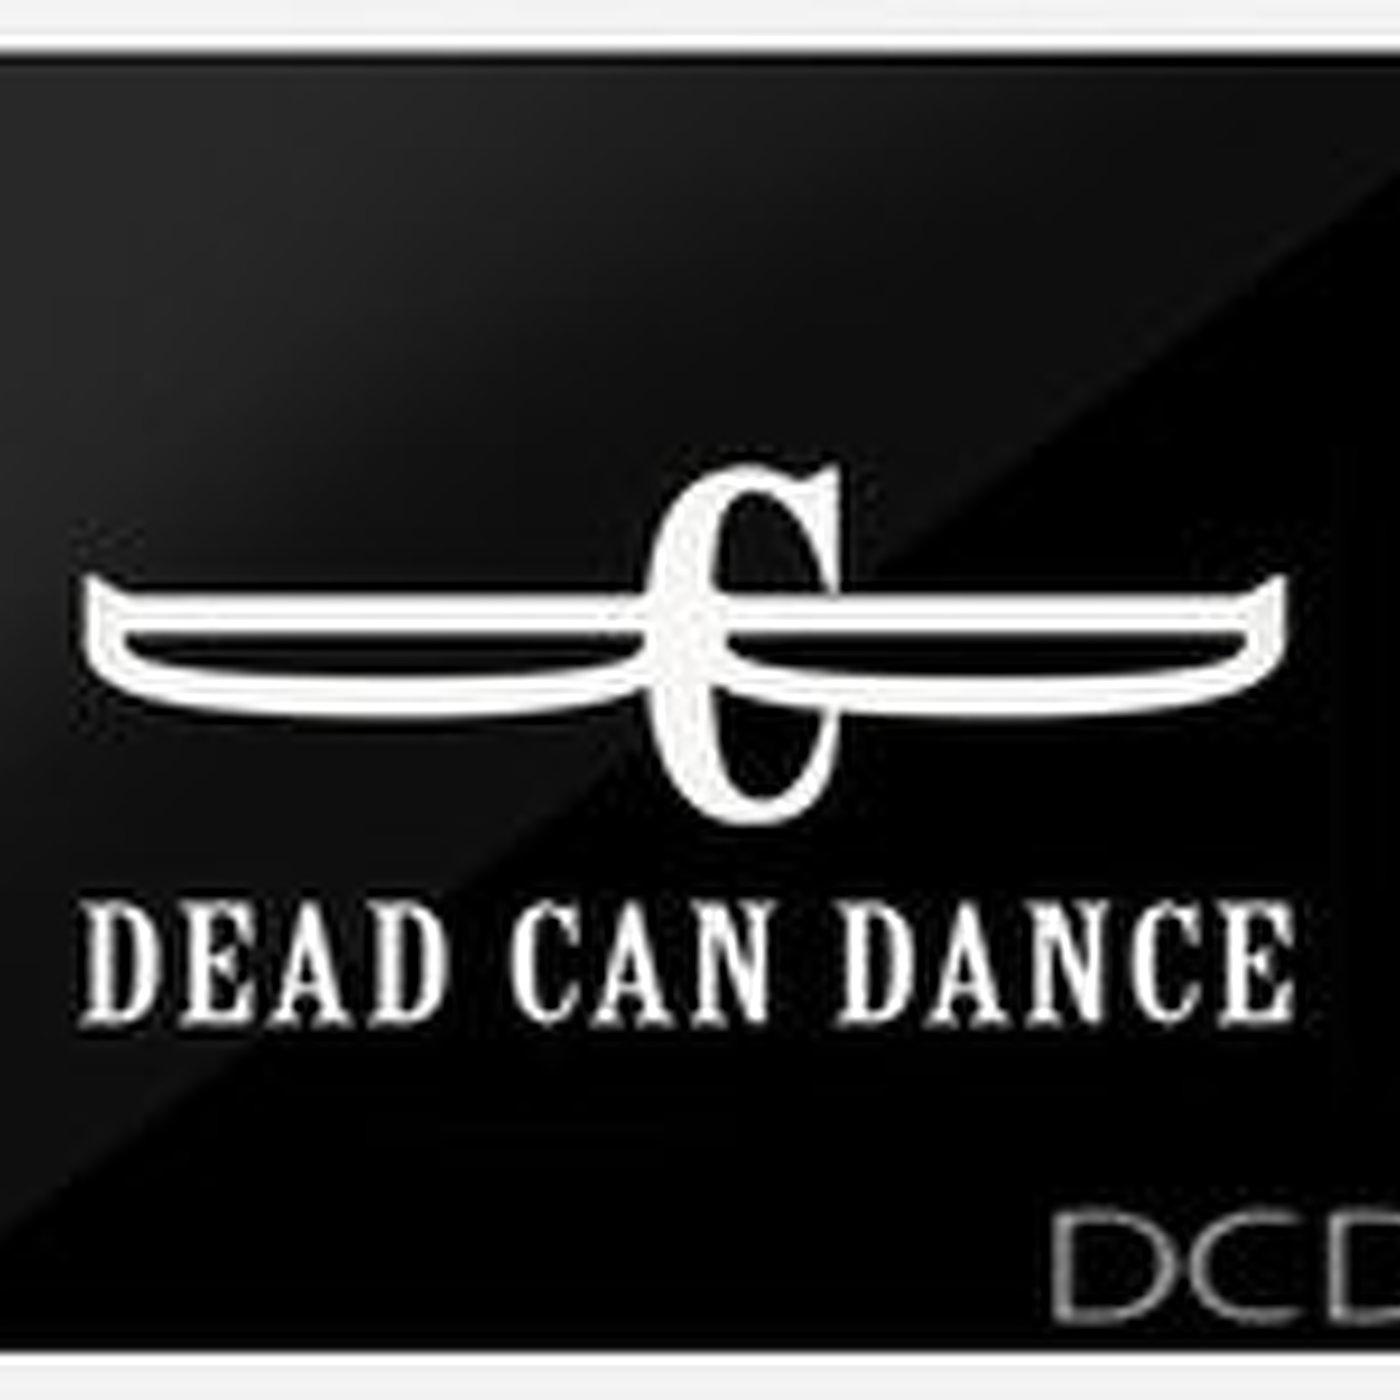 Dead can dance yulunga spirit dance en musicas milenio for Cuarto milenio radio horario